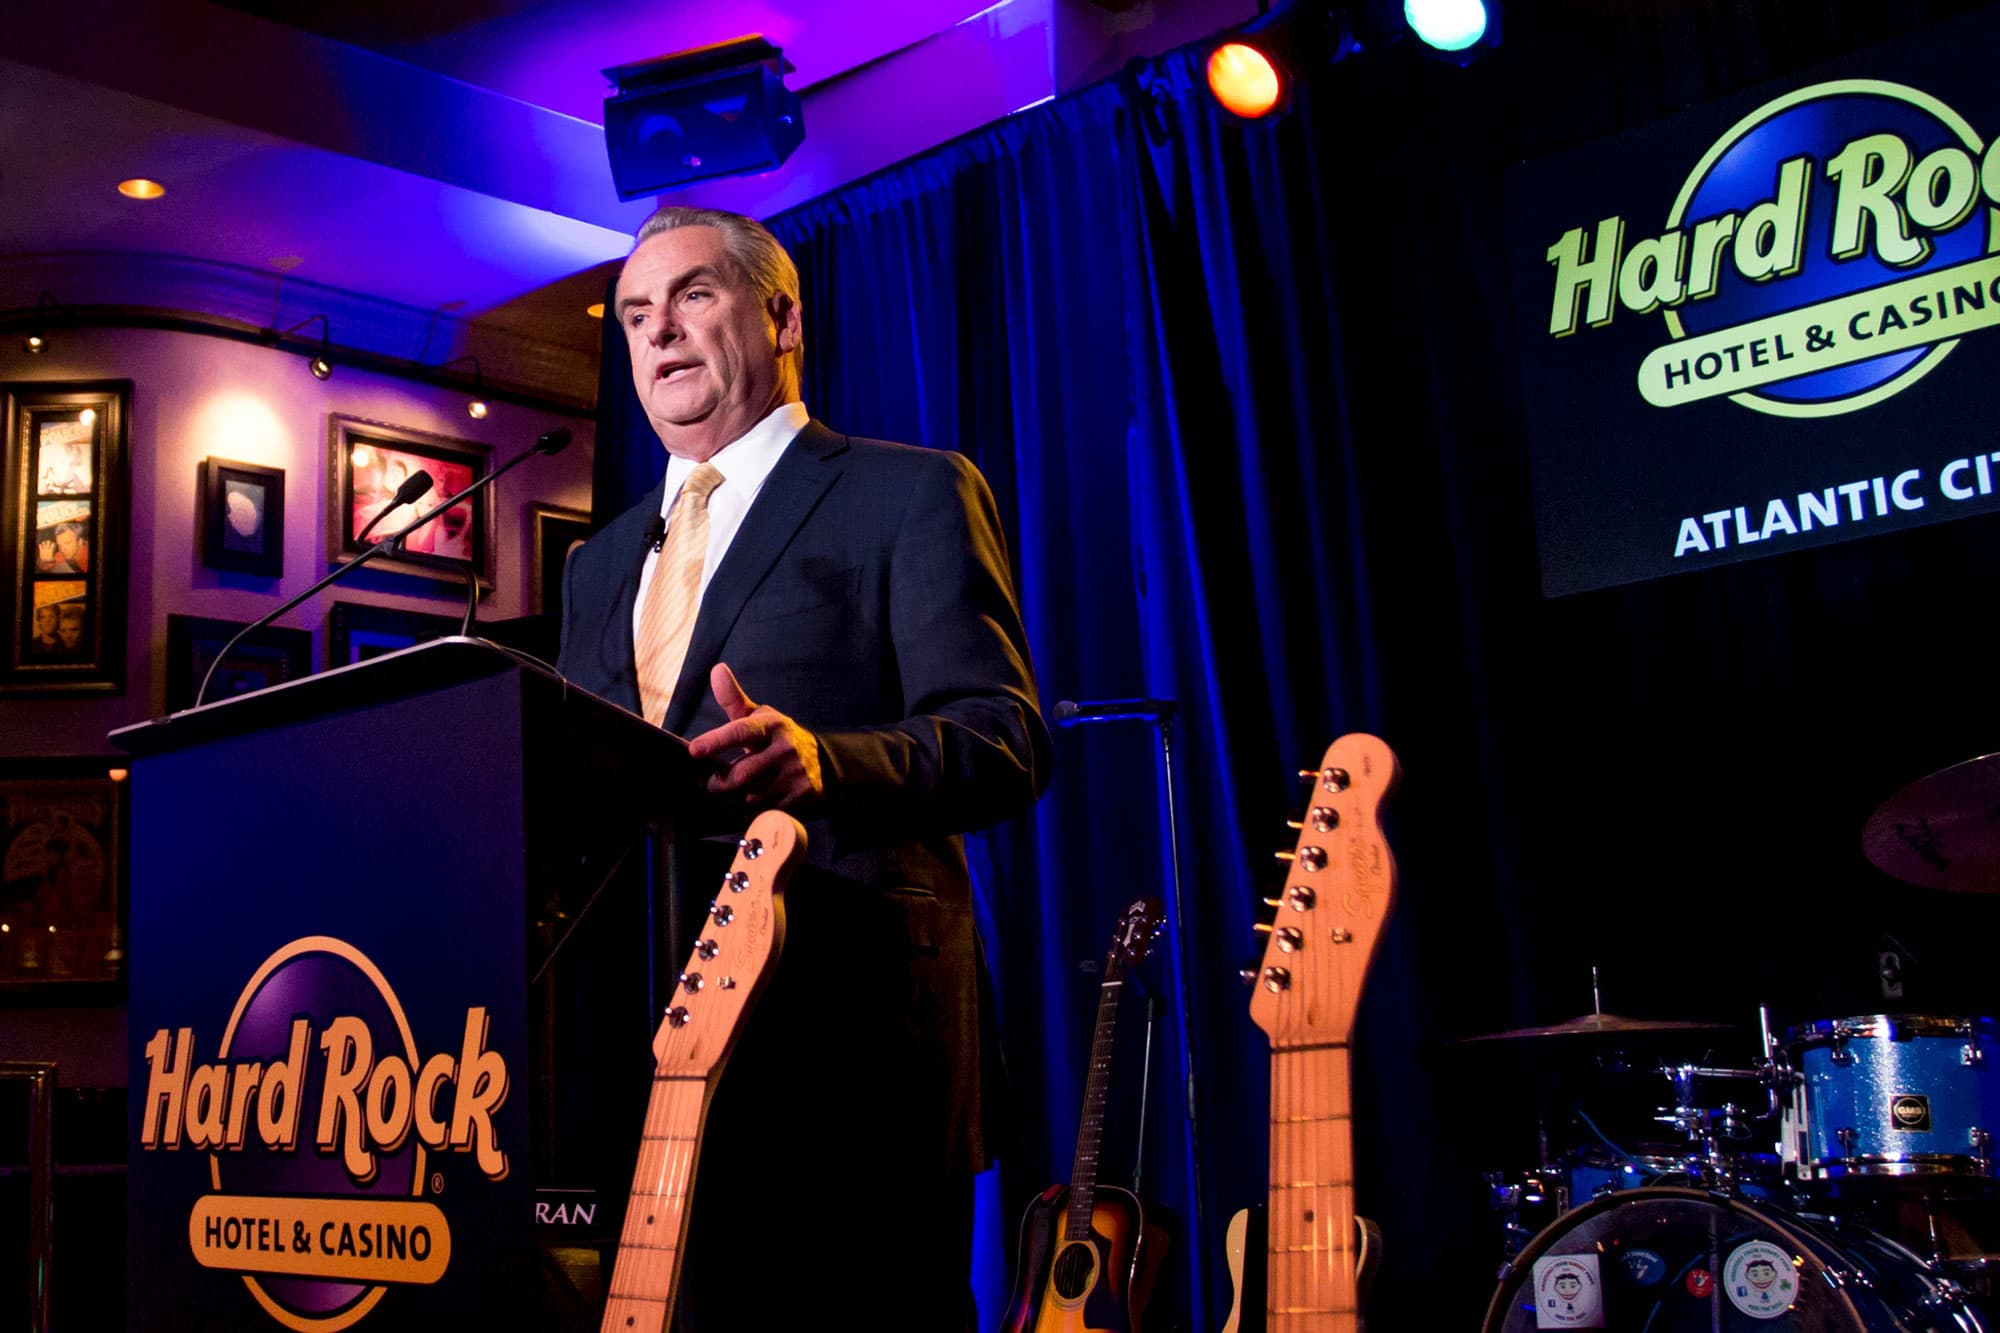 hard rock casino atlantic city jack morris